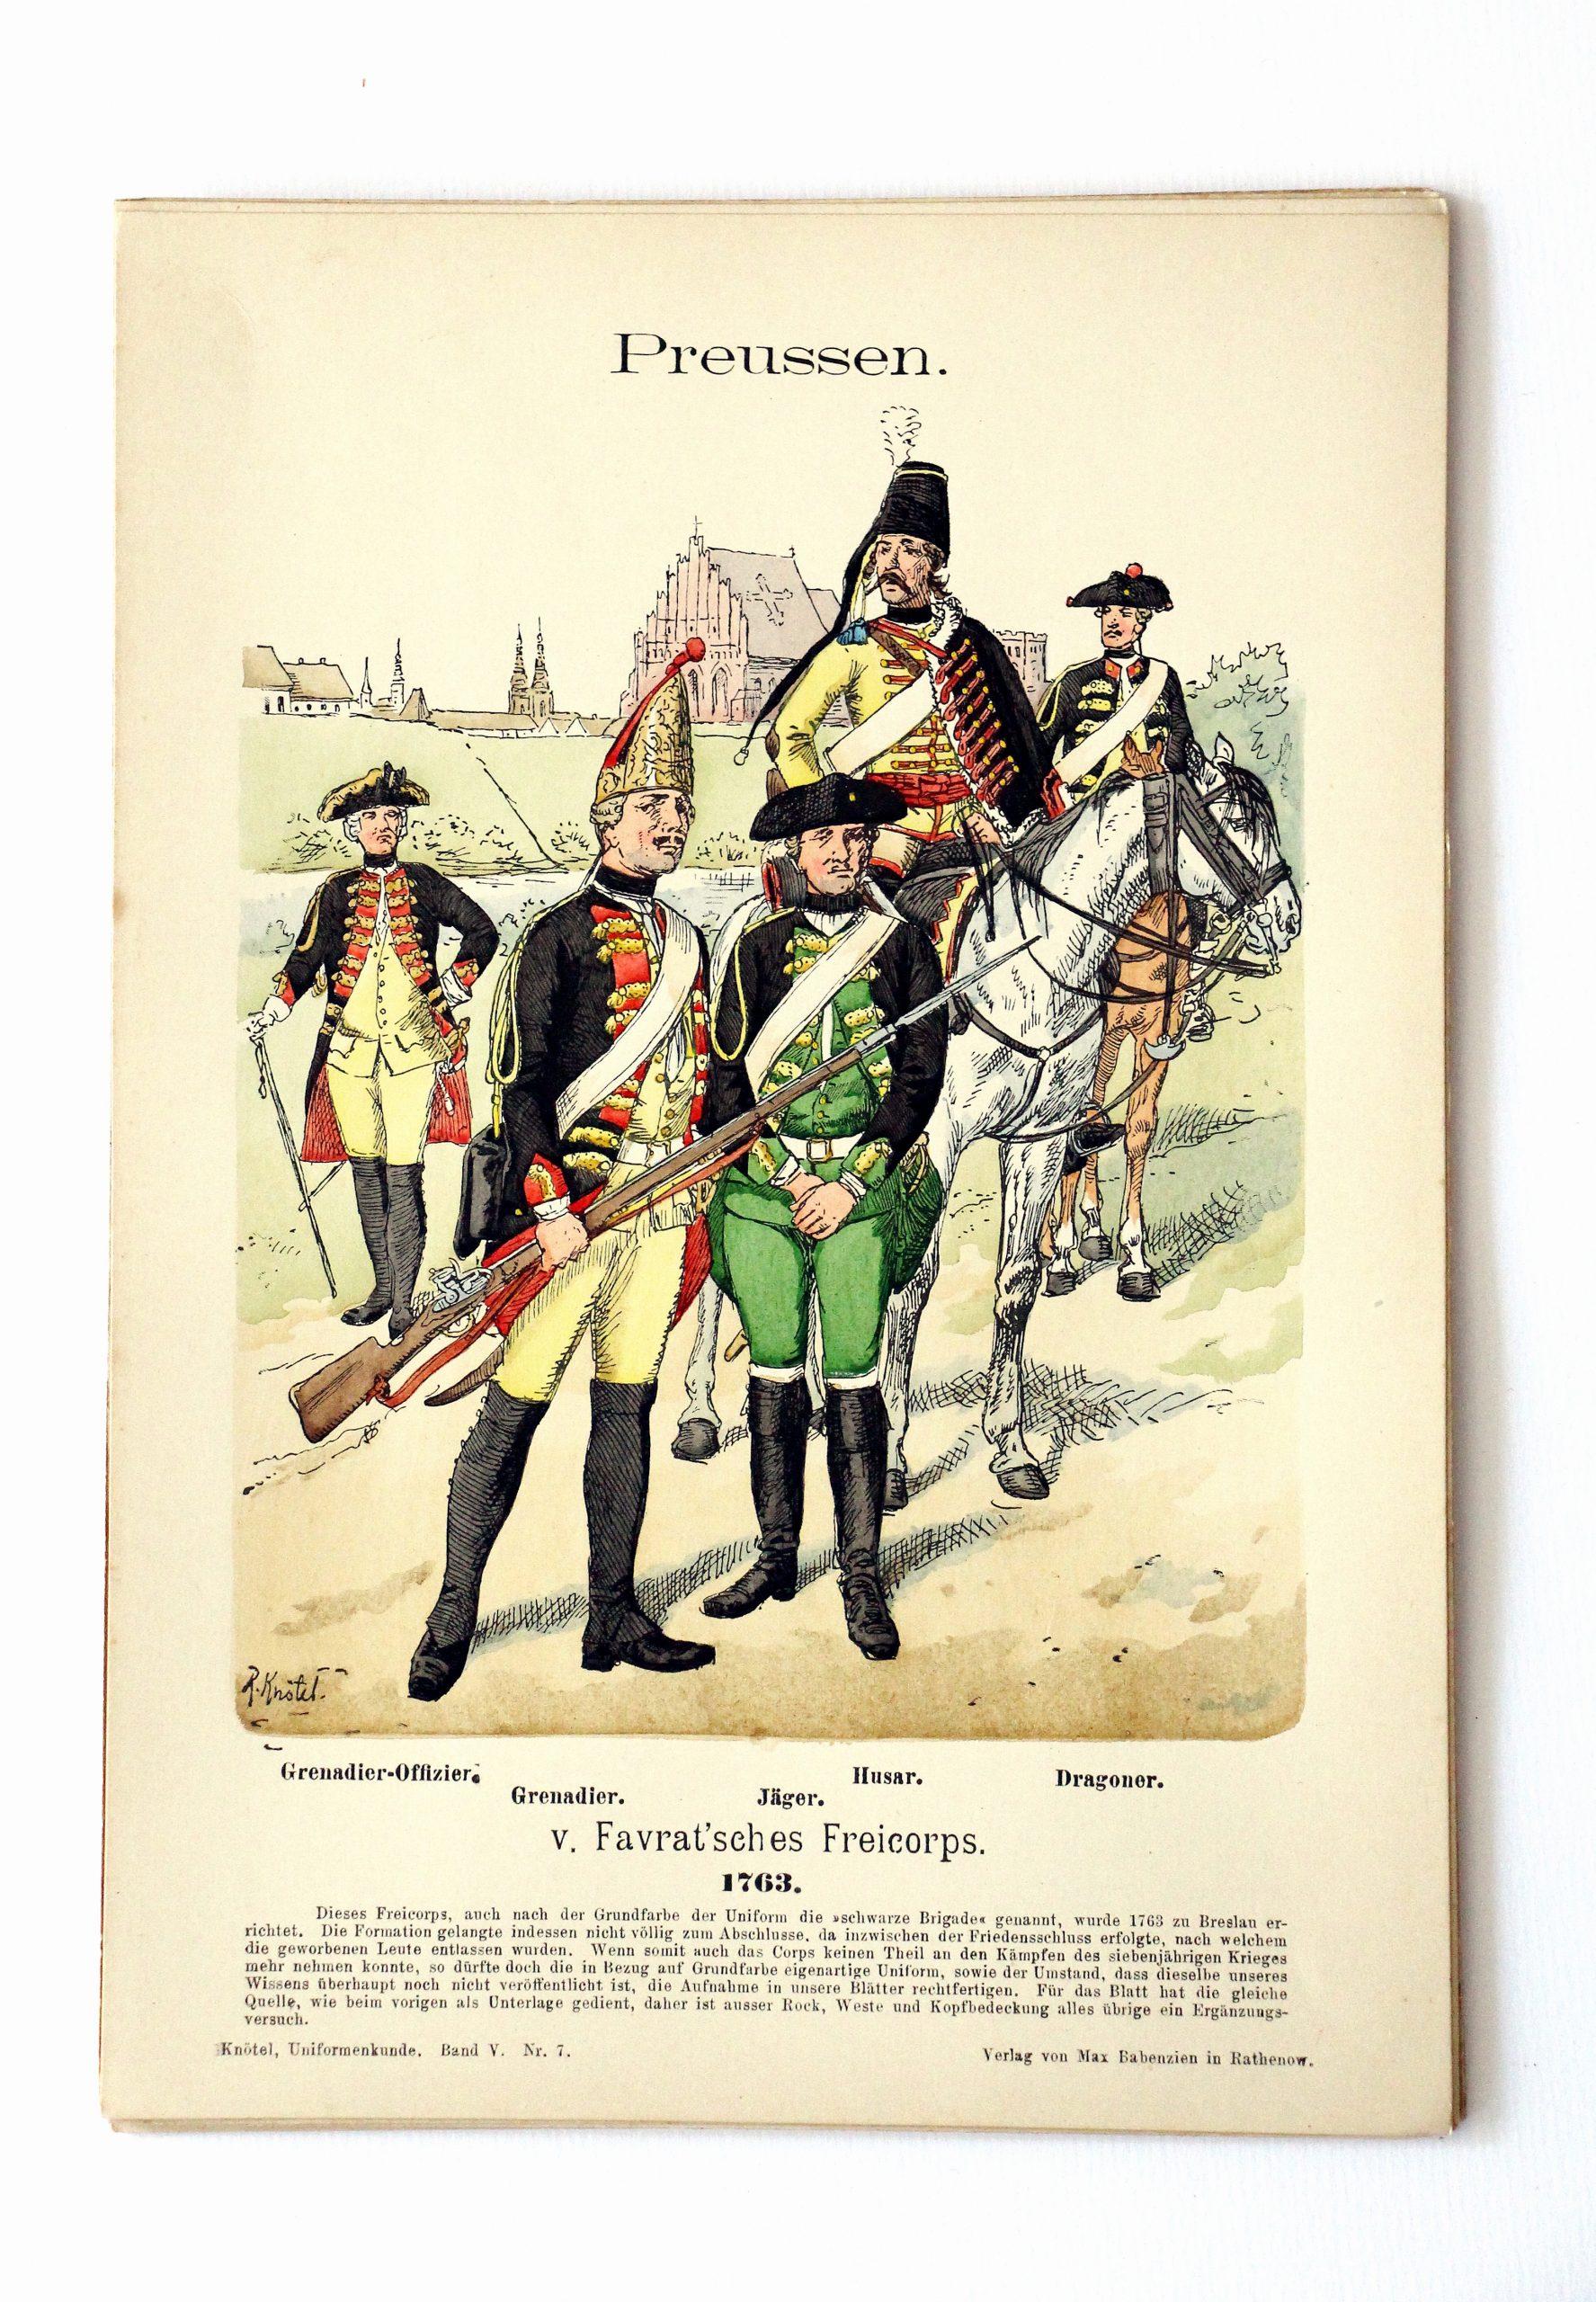 Preussen- Uniformenkunde - Richard Knoetel - V - Planche 7